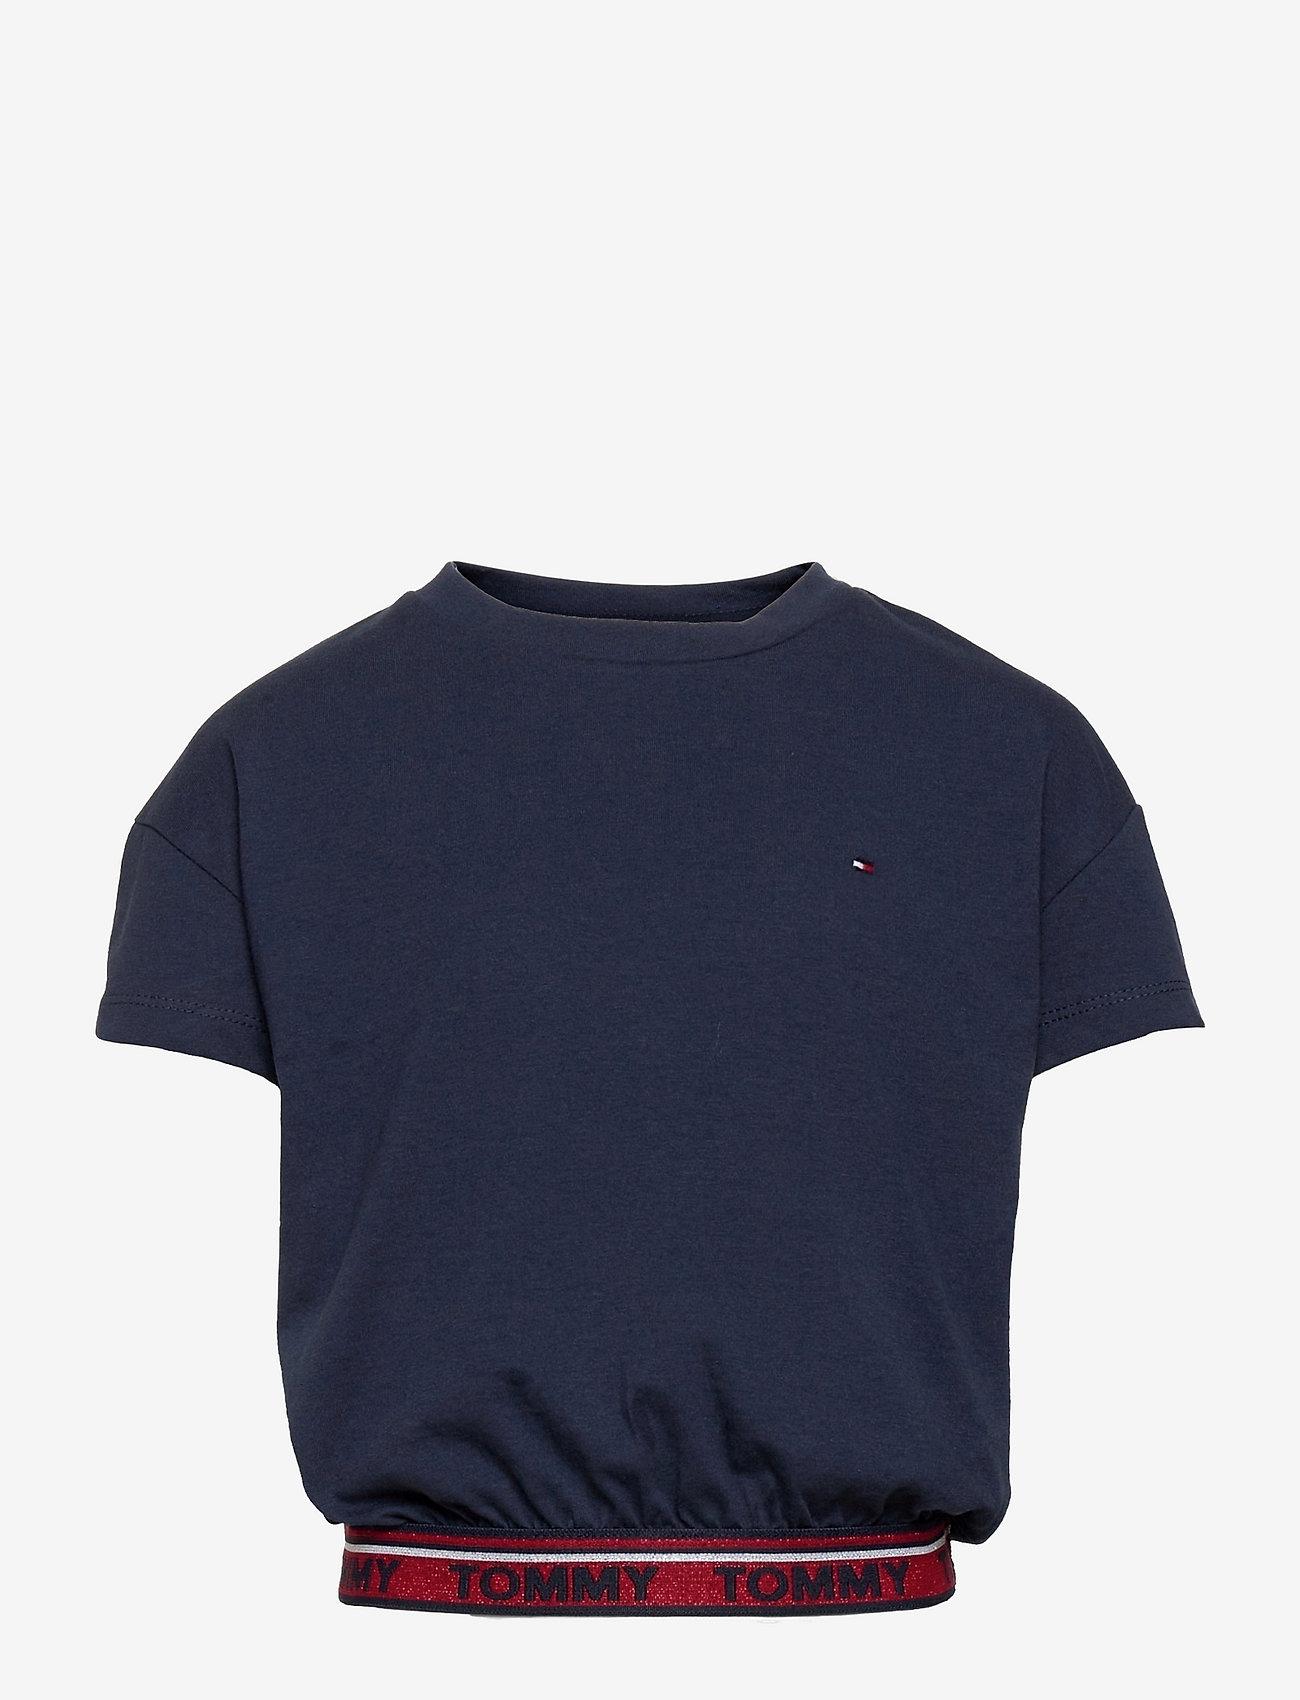 Tommy Hilfiger - TOMMY LUREX RIB  TOP S/S - plain short-sleeved t-shirt - twilight navy - 0